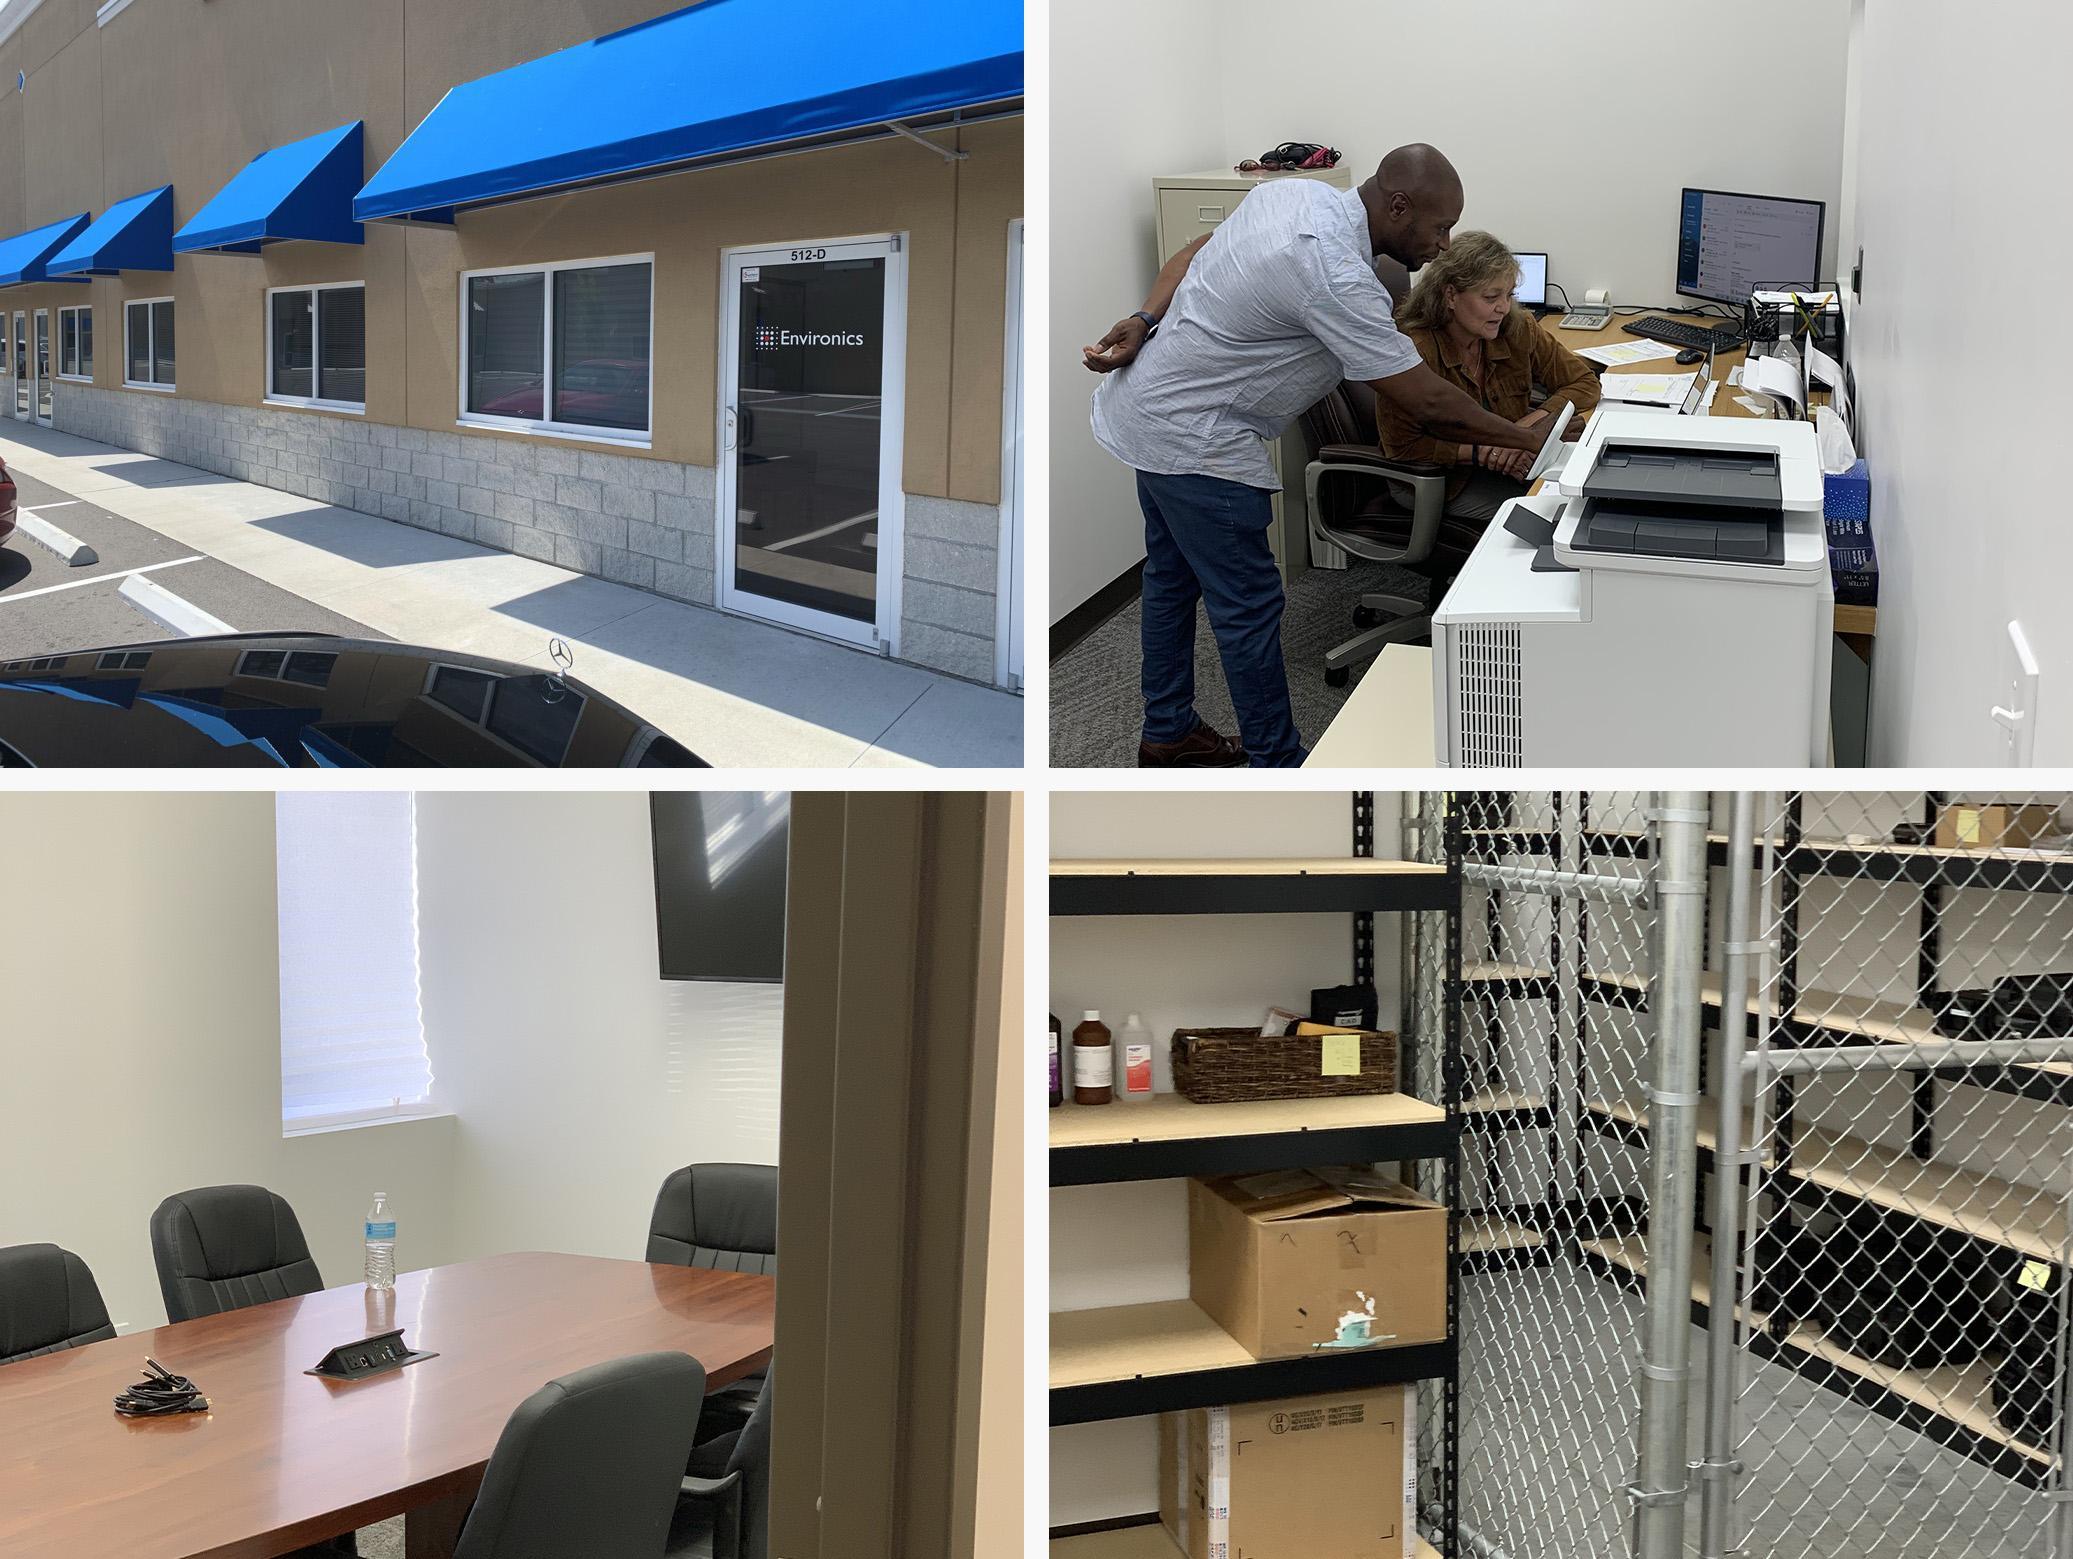 Environics office in Florida, USA